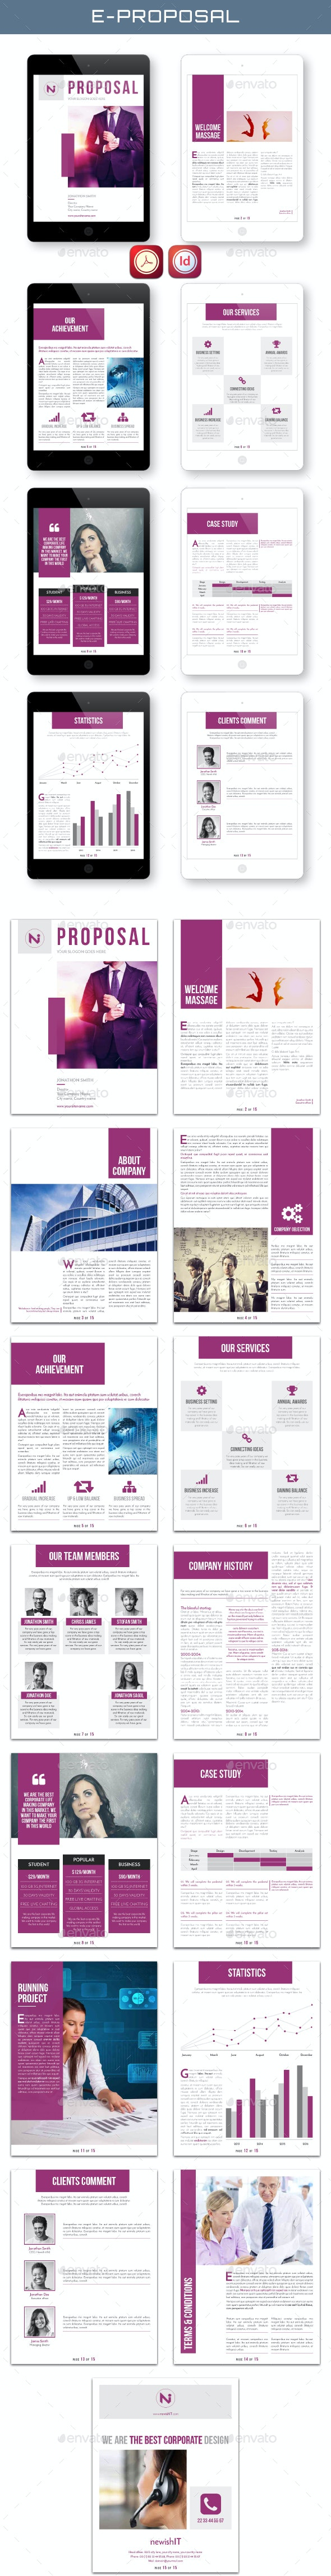 E-Proposal - Digital Books ePublishing